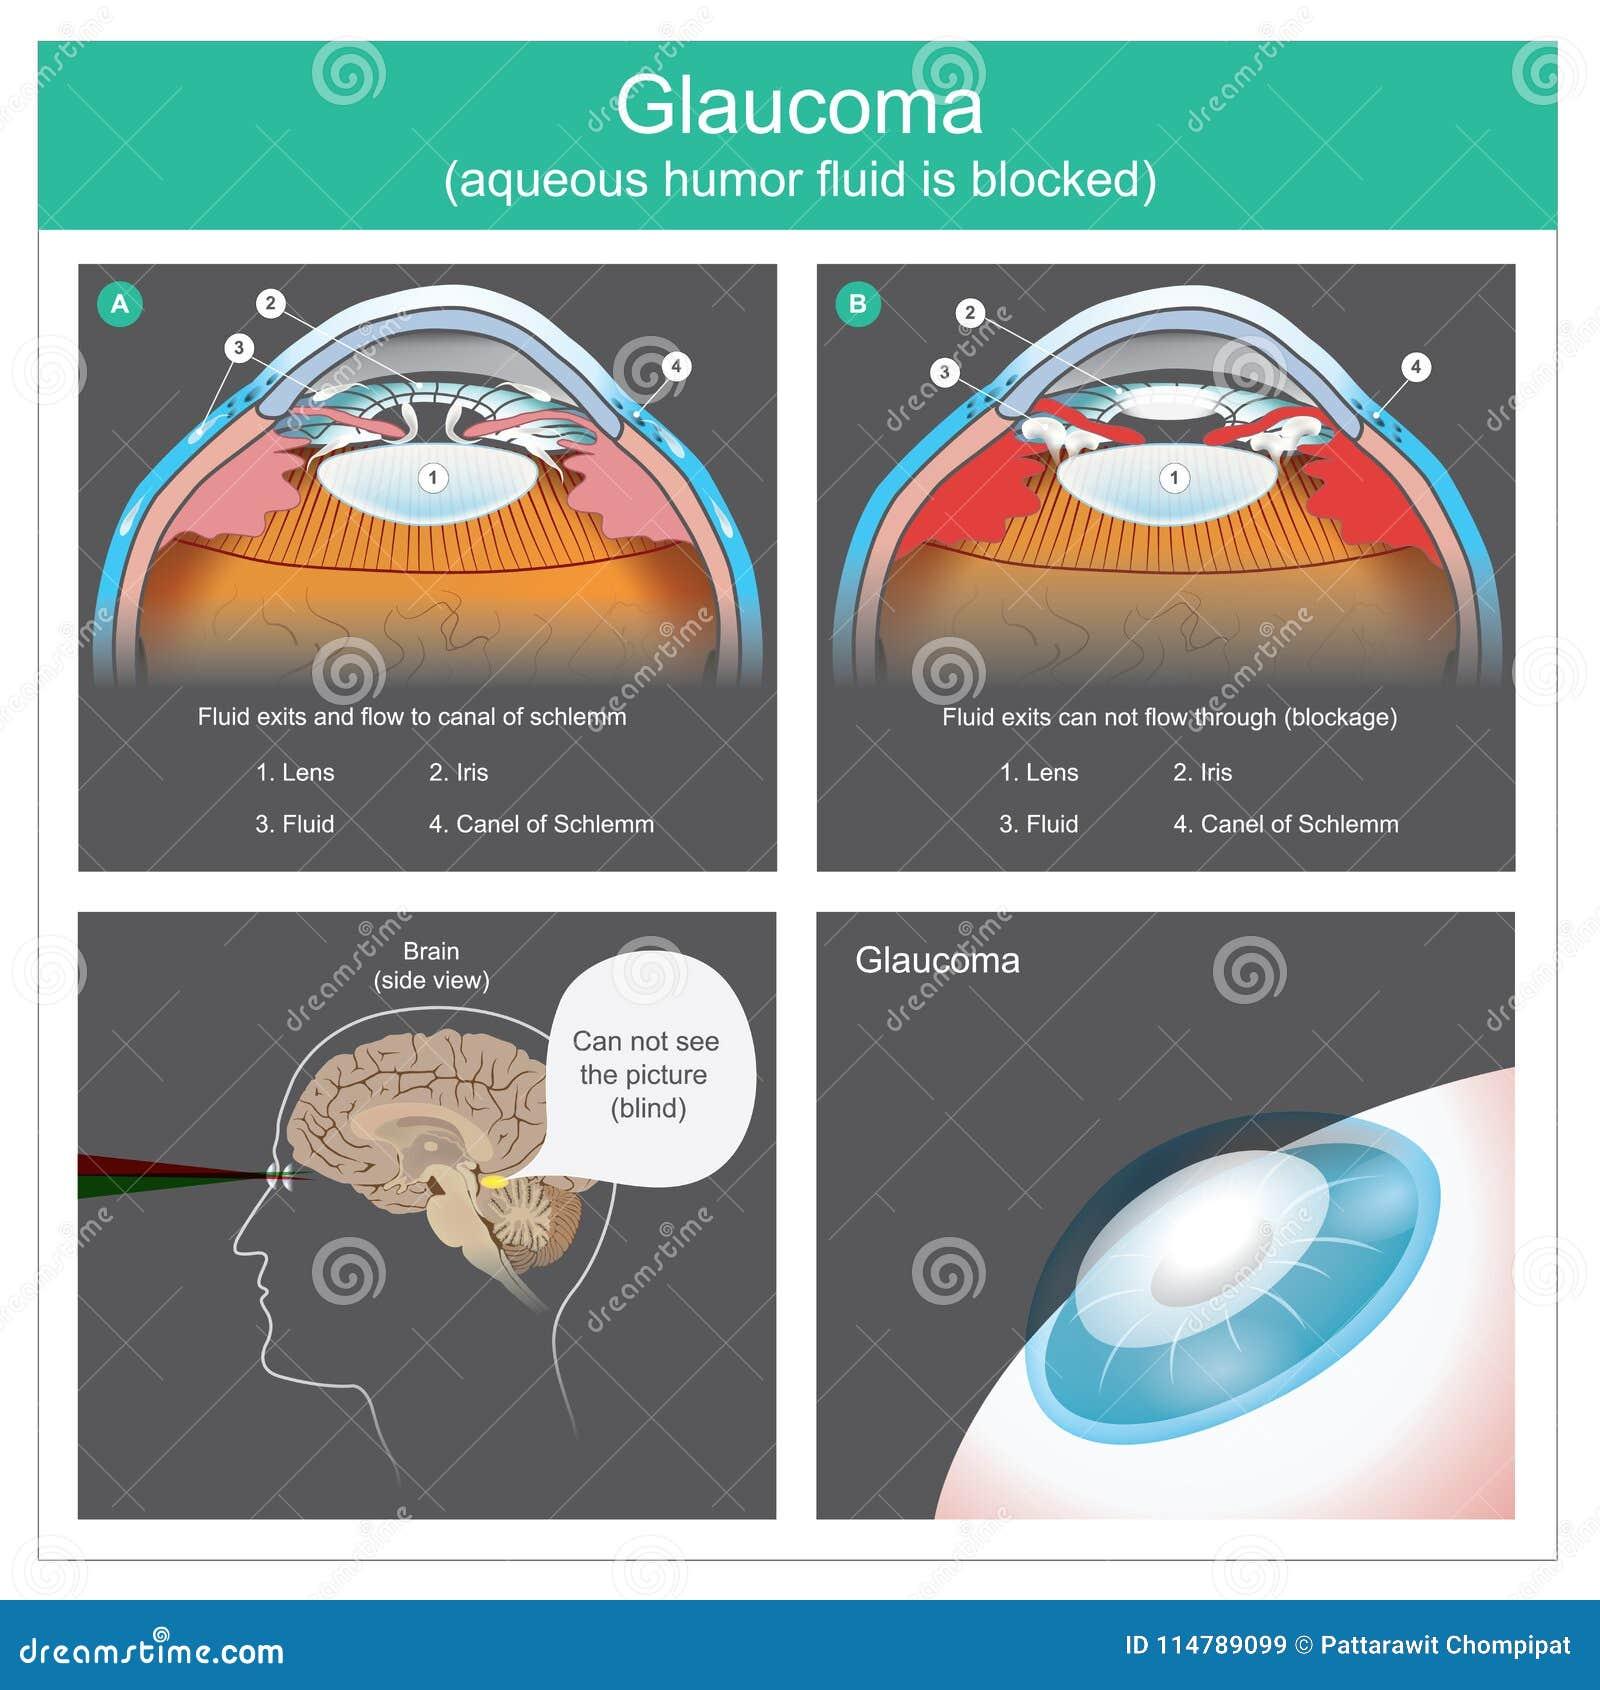 Excelente Diagrama Rotulado Ojo Modelo - Imágenes de Anatomía Humana ...